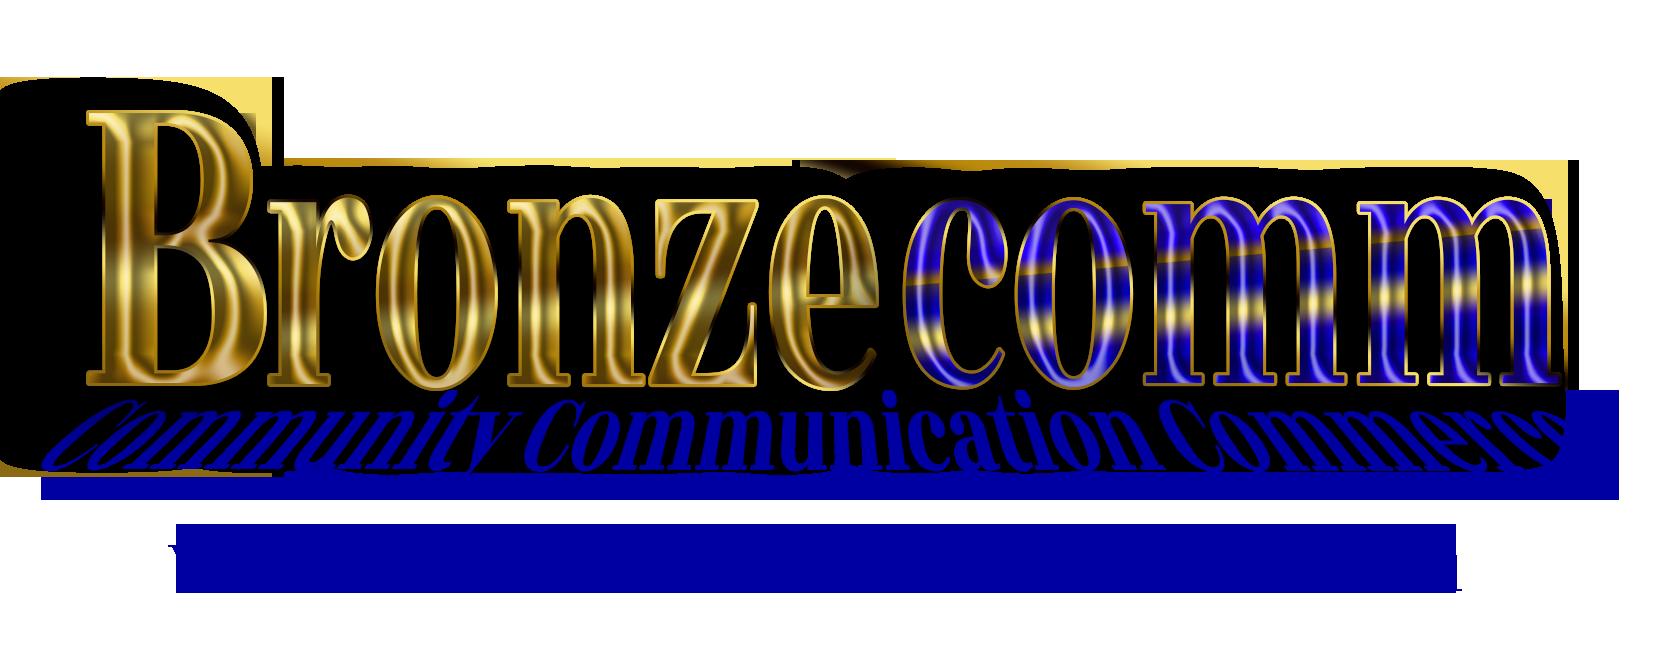 Bronzecomm.com